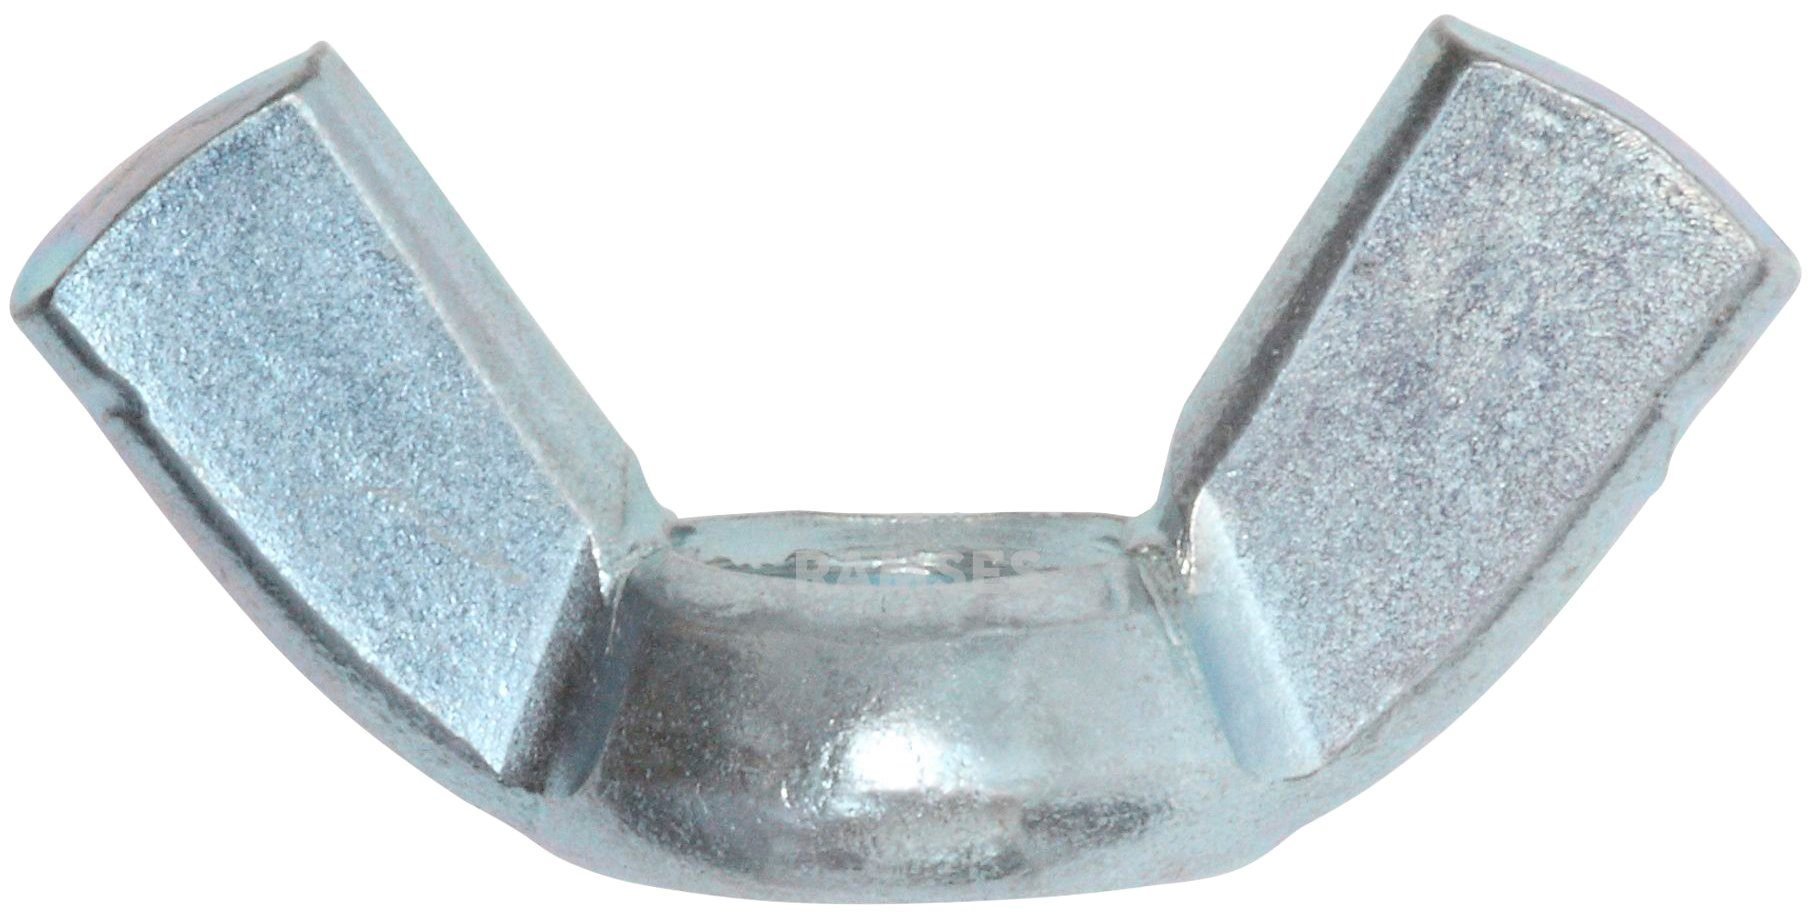 RAMSES Flügelmutter , DIN 315 Amerikanische Form M5, 100 Stück